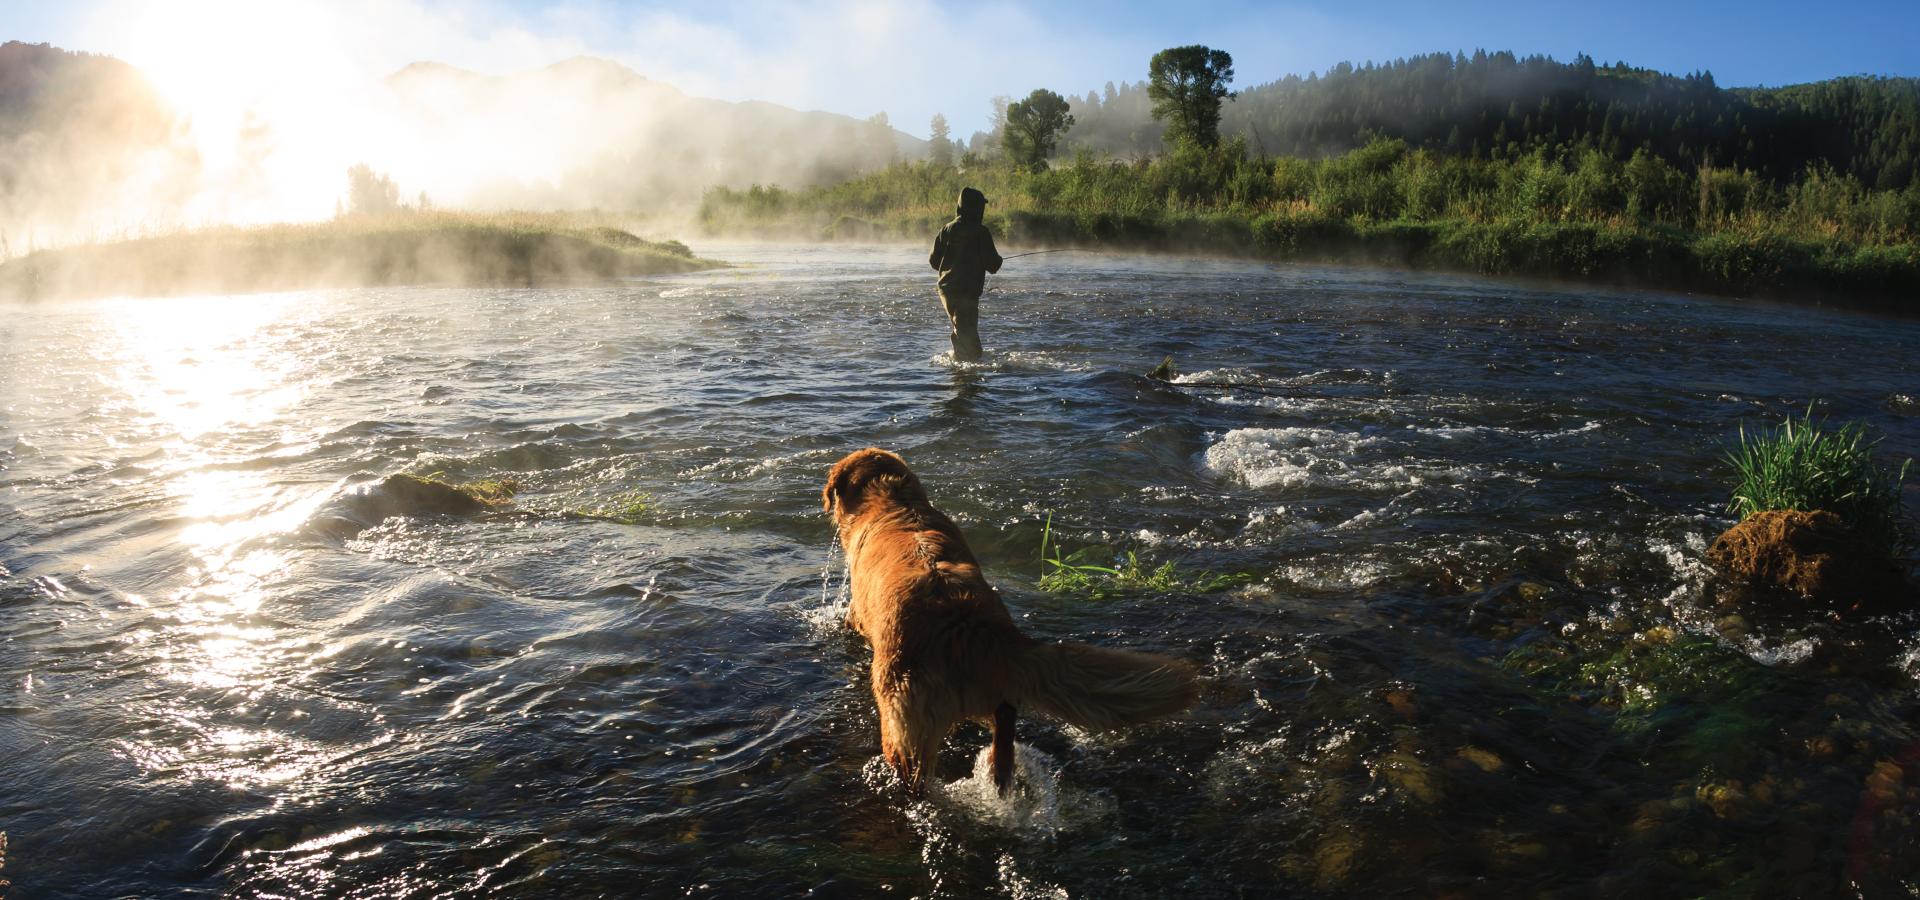 Fishing in Idaho